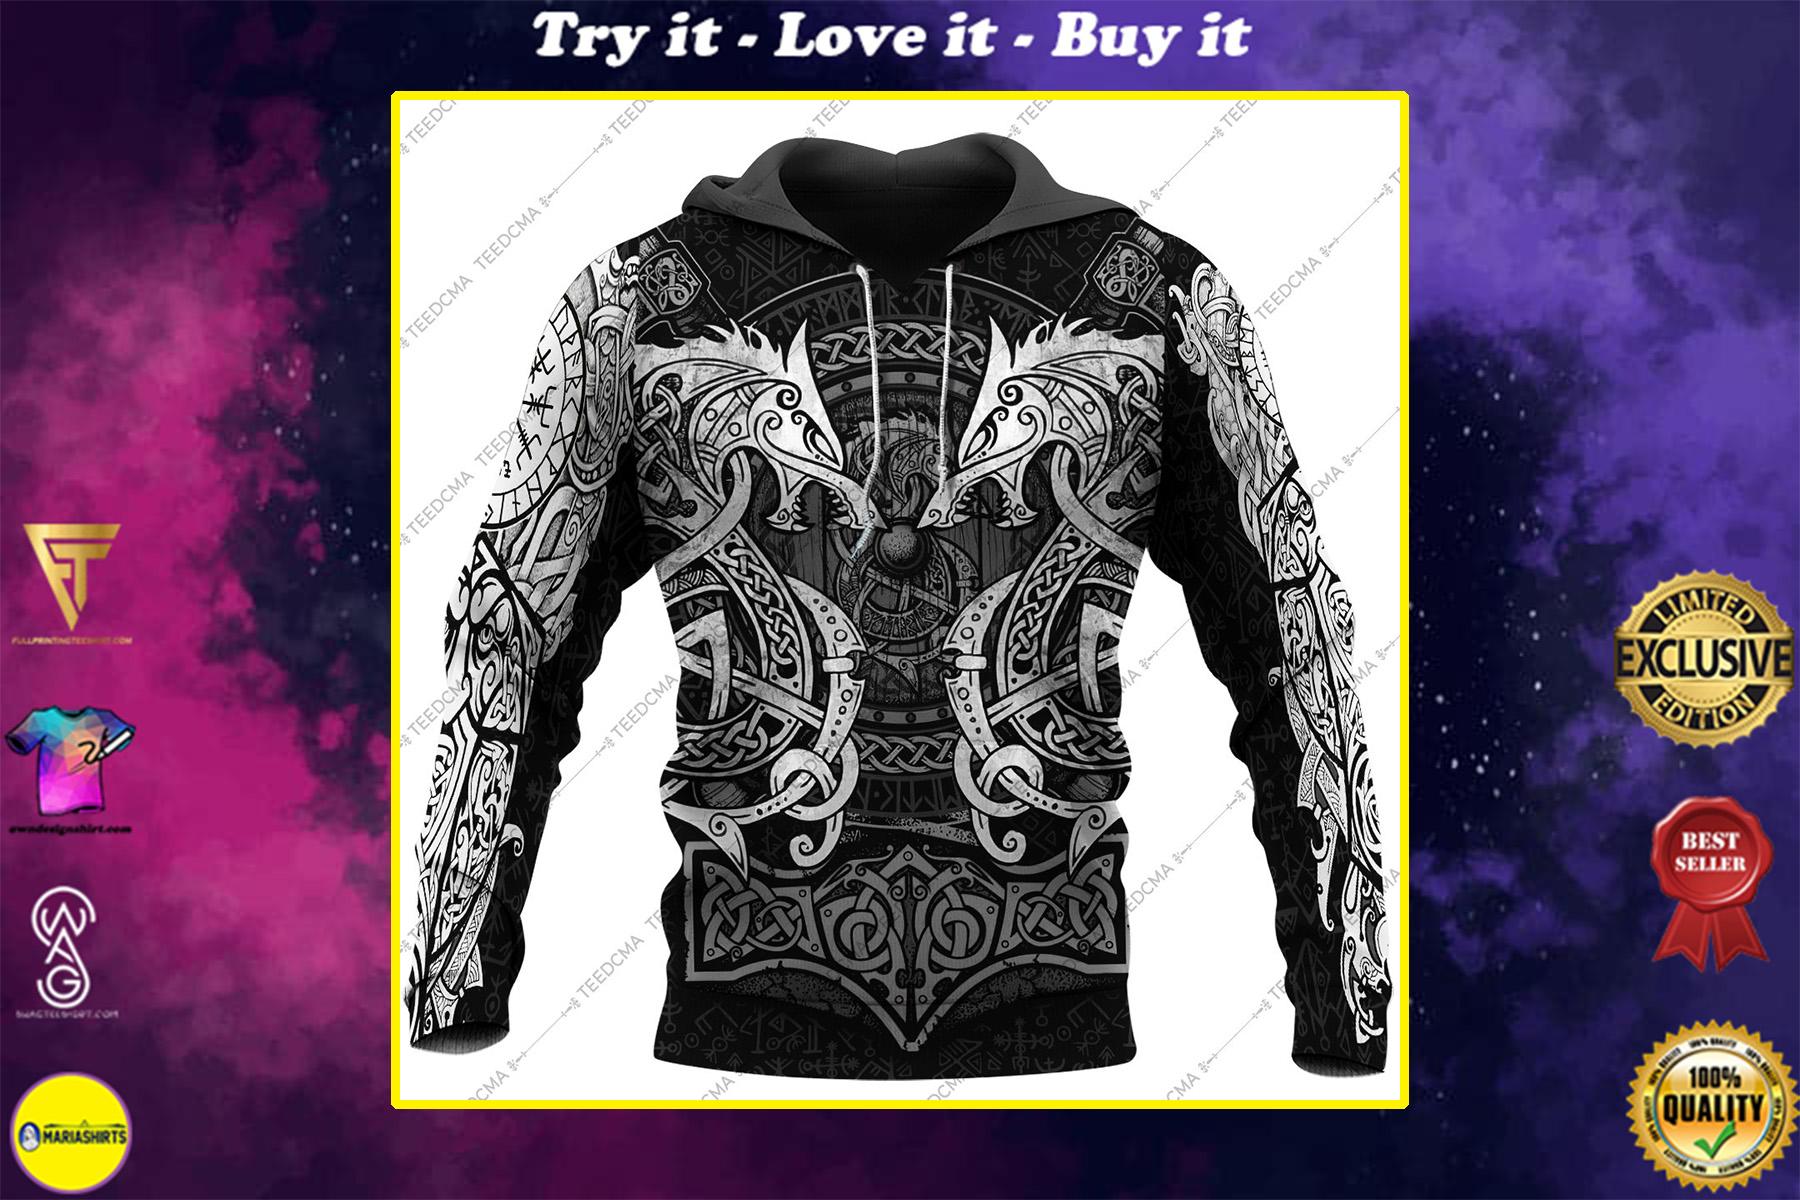 fenrir viking tattoo style all over printed shirt